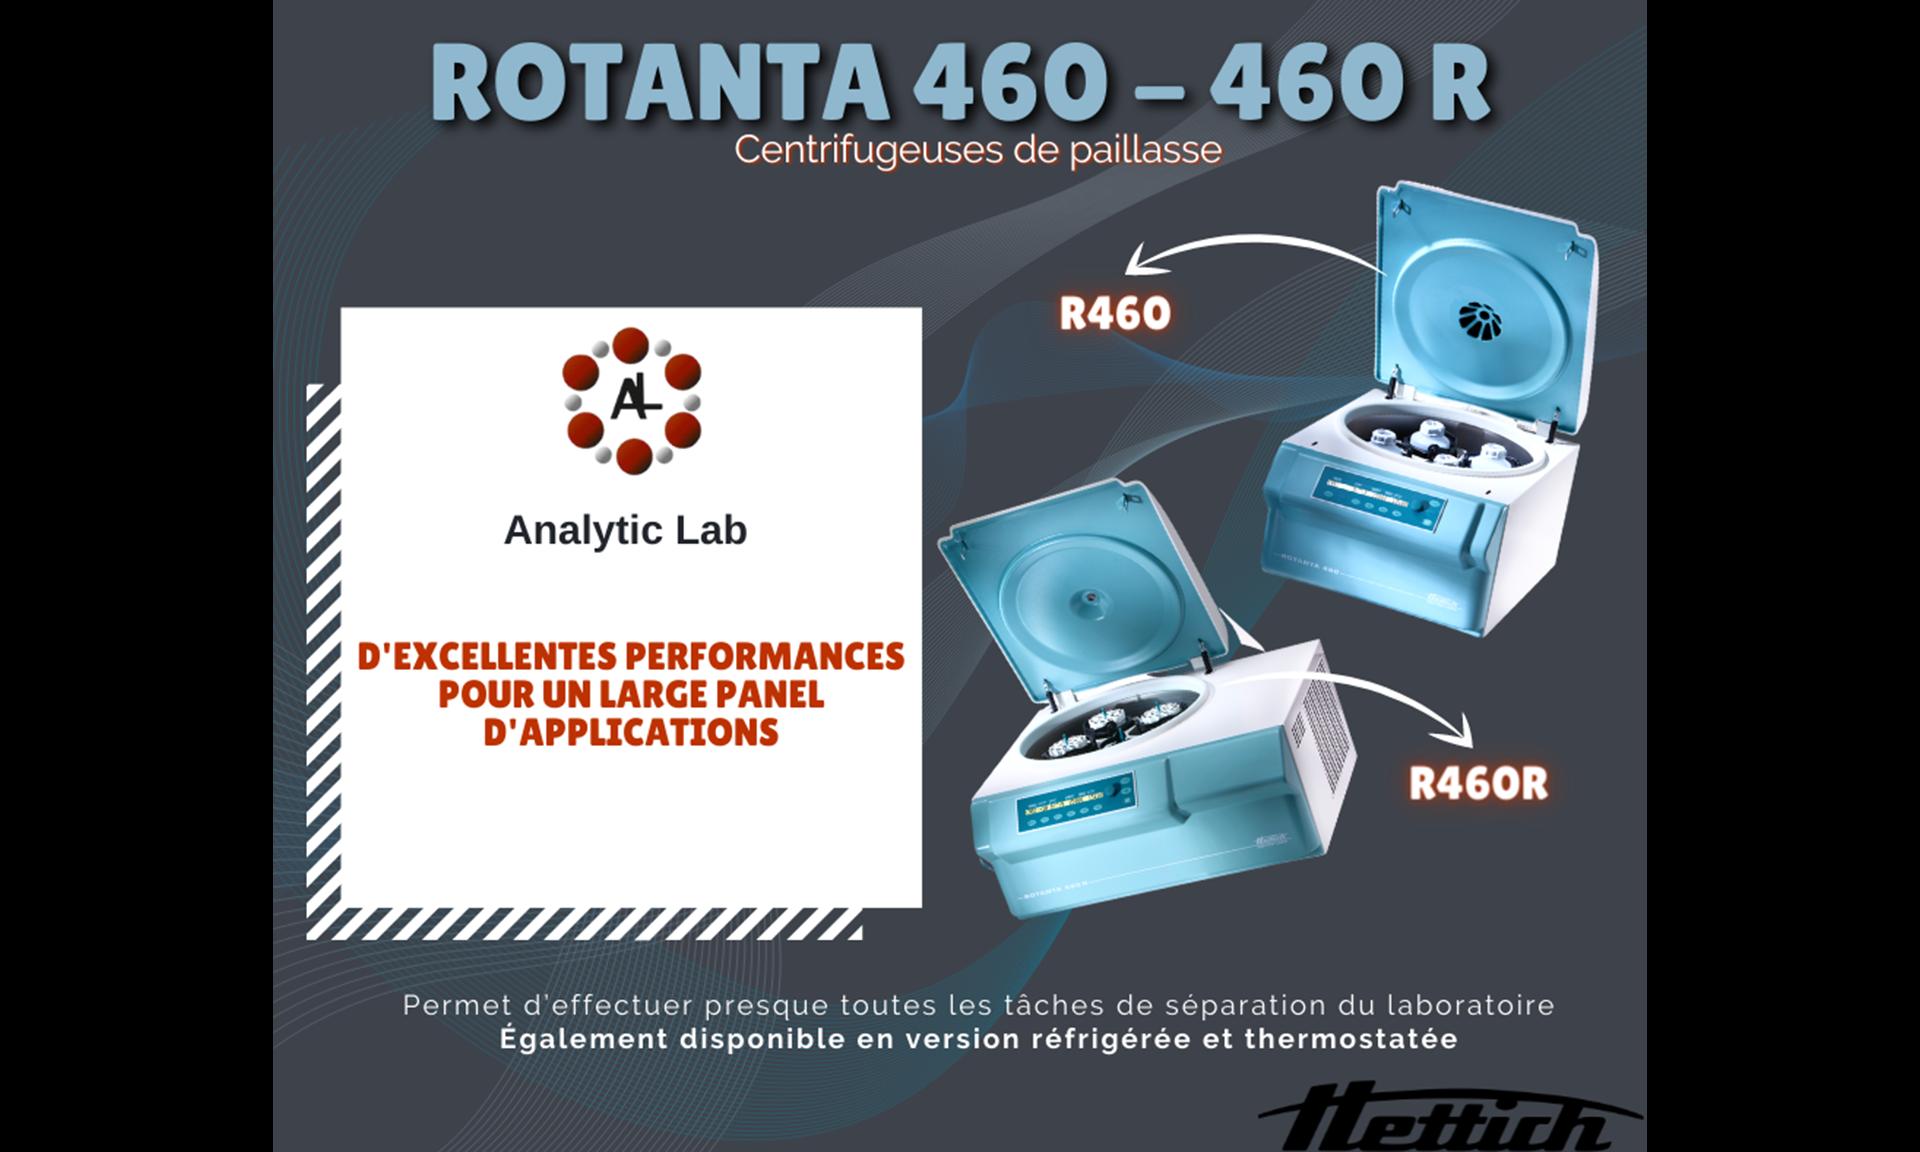 Centrifugeuse Rotanta 460 de notre partenaire Hettich France